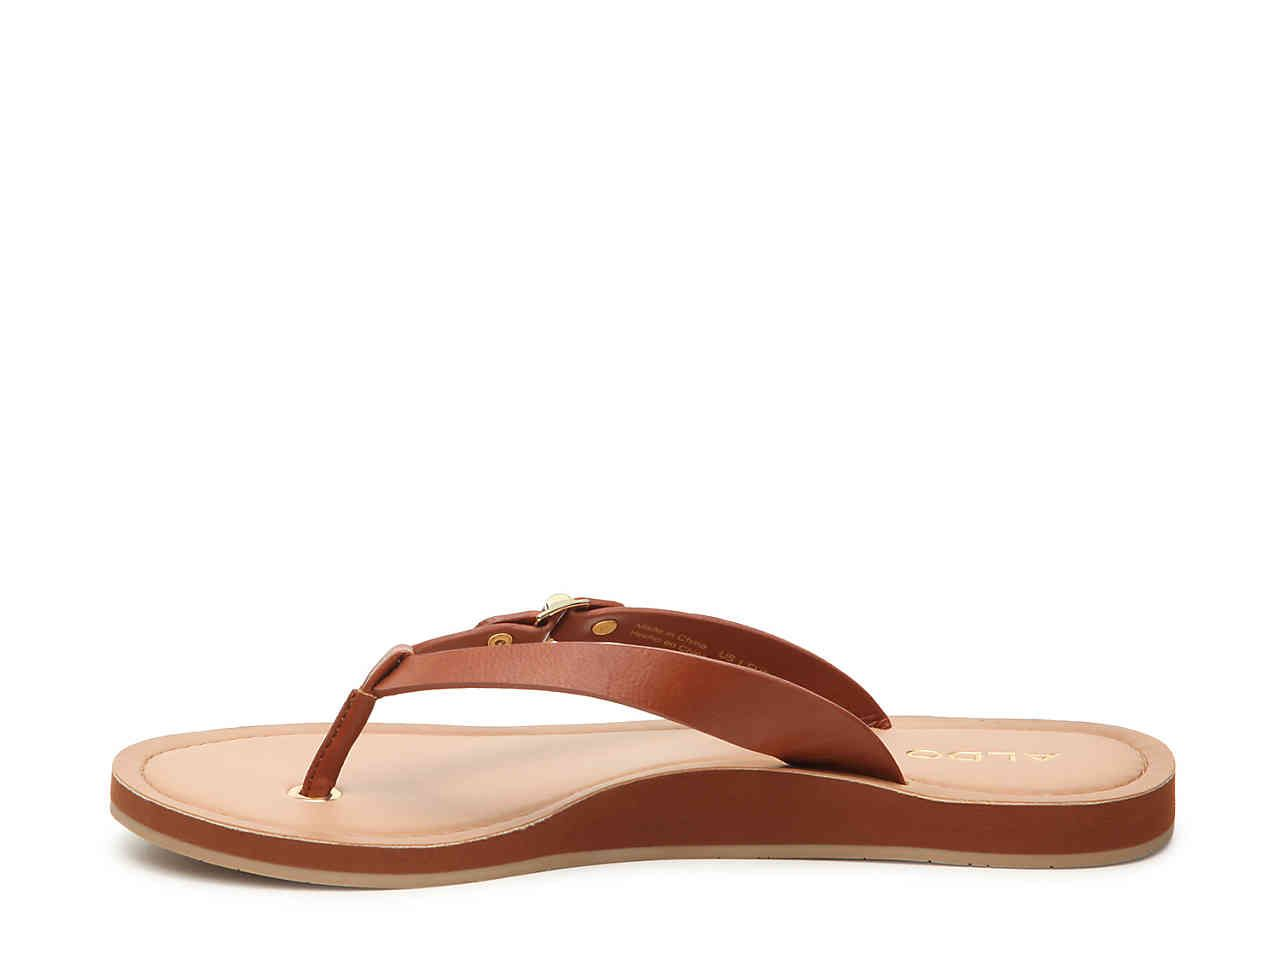 Aldo Prardodia Sandal | Sandals, Womens